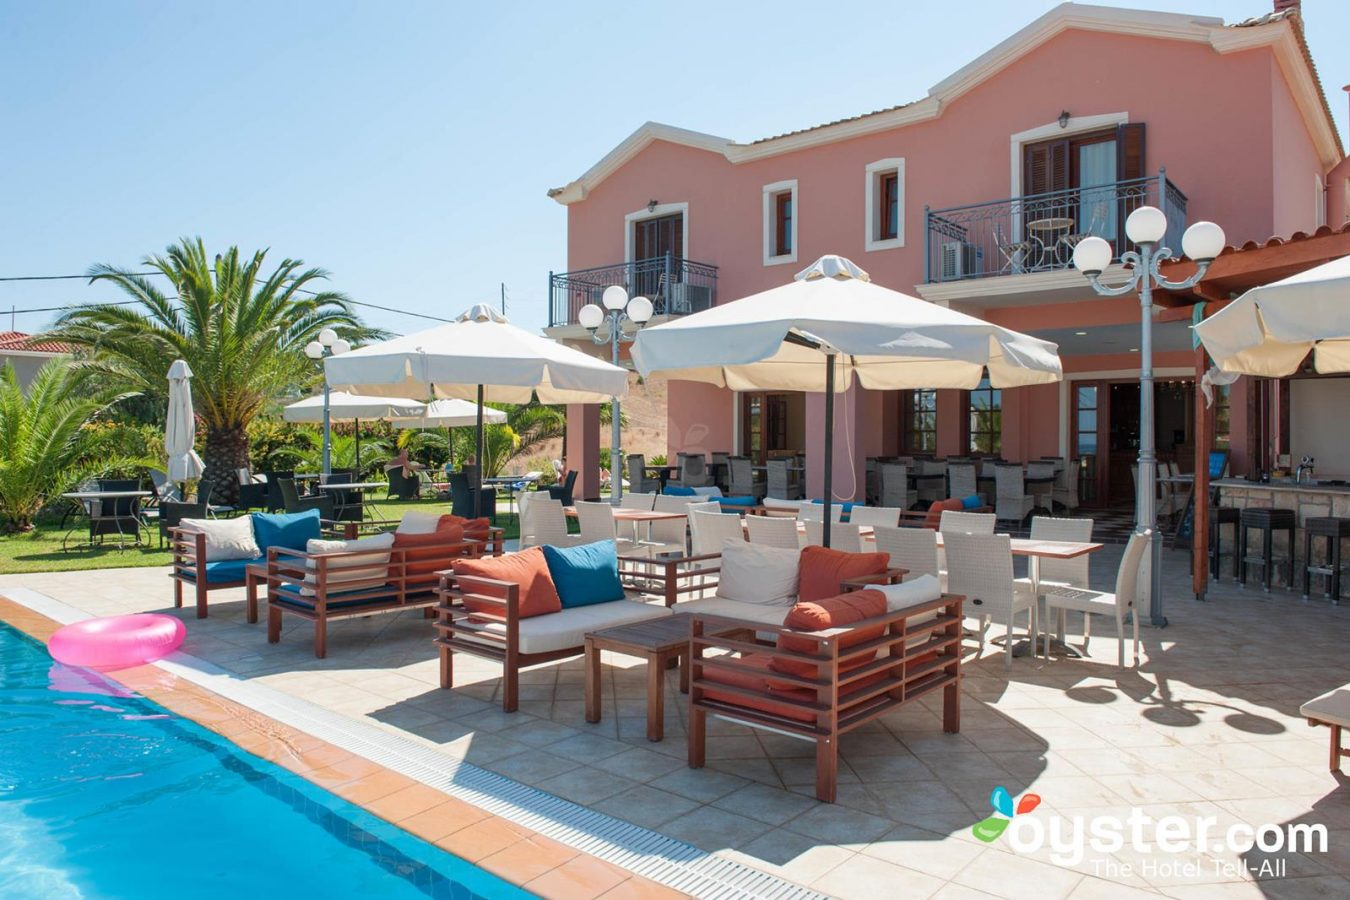 Hotel Pool Bar in Skala Kefalonia - Melidron Hotel Kefalonia